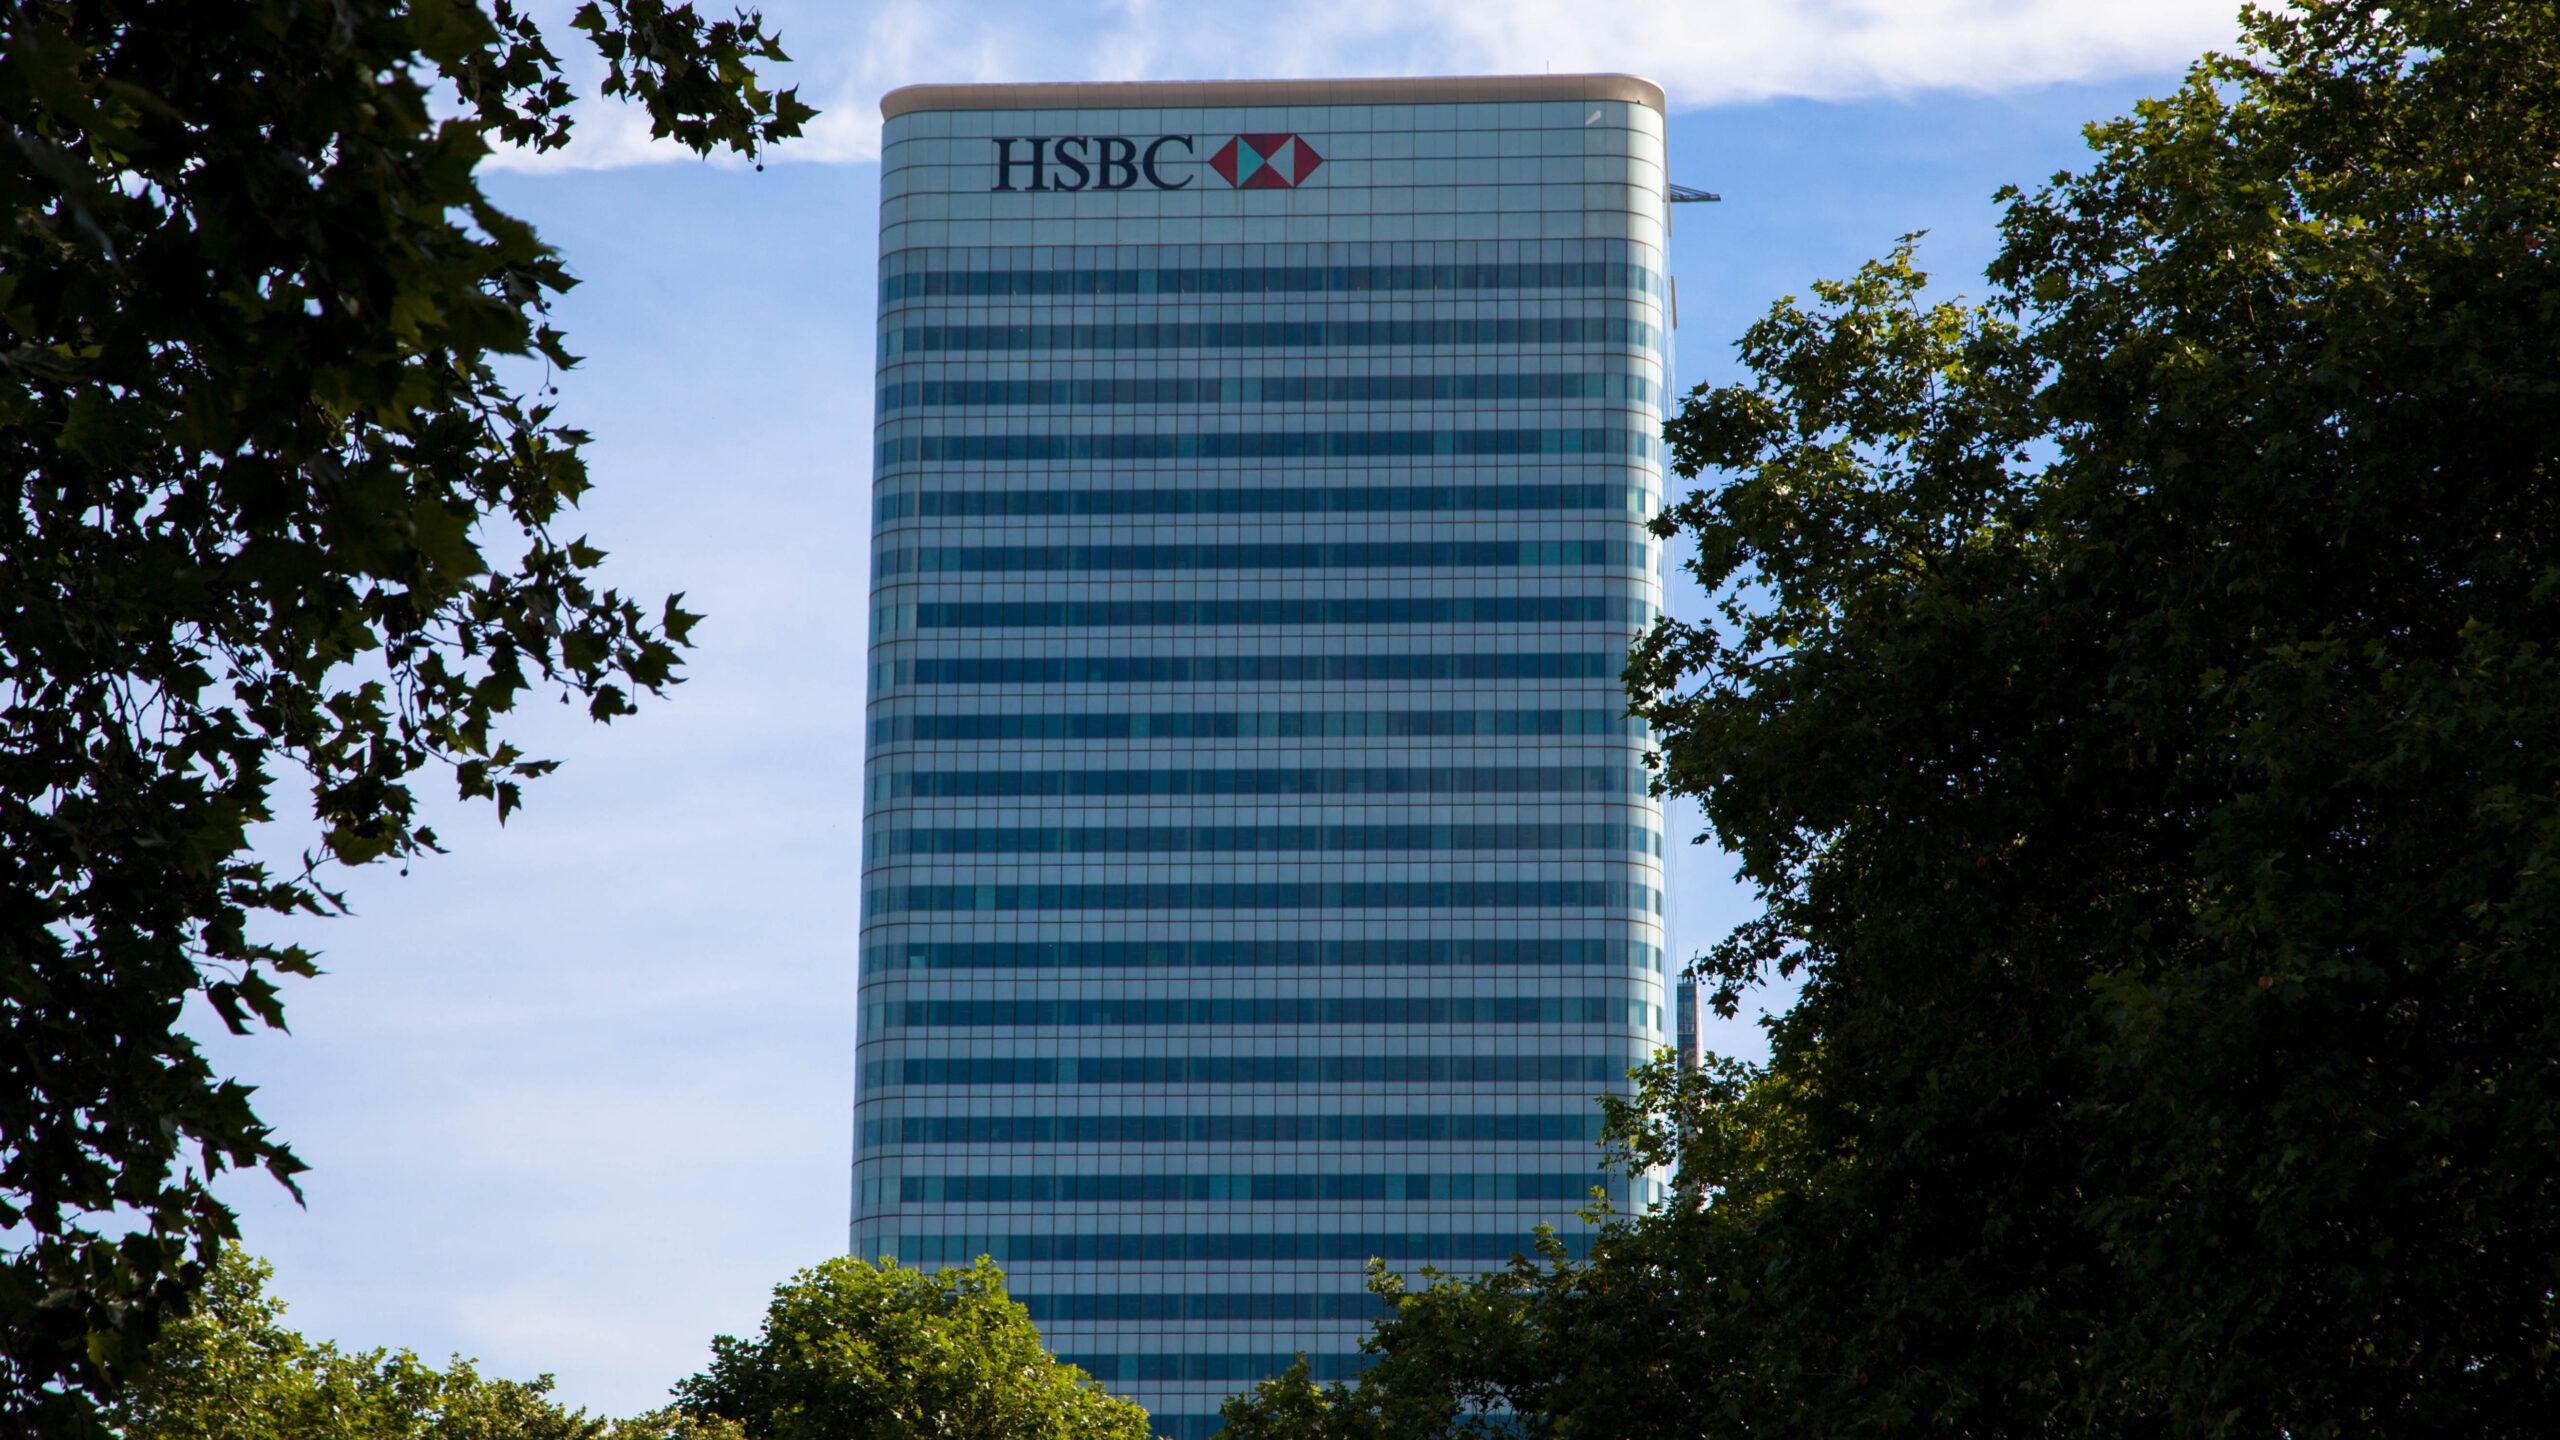 hsbc-hq-building-high-res